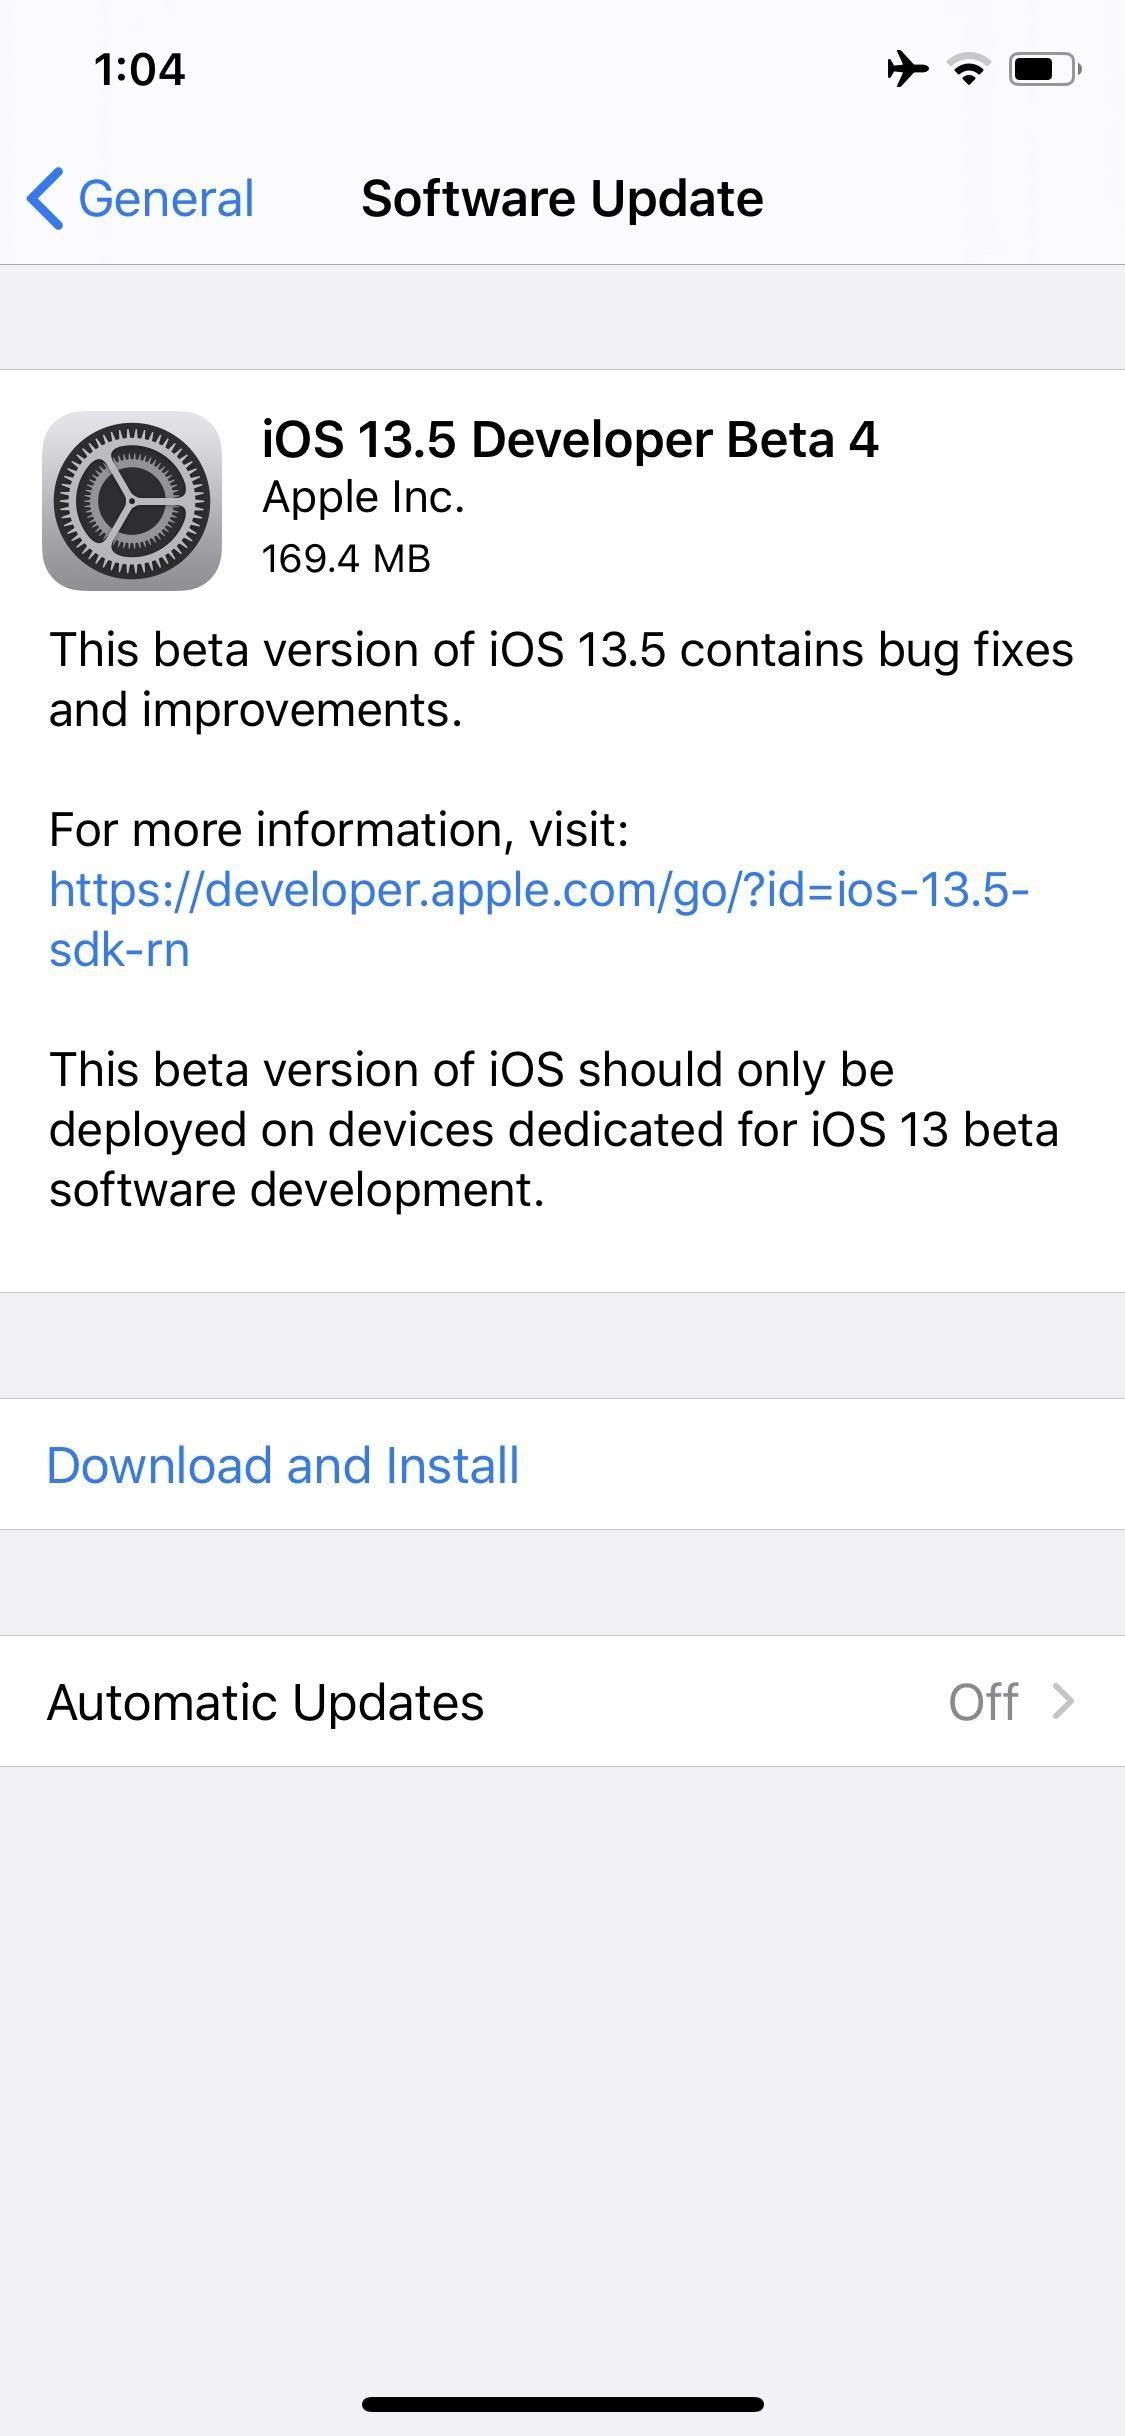 Apple Releases iOS 13.5 Developer Beta 4 for iPhone